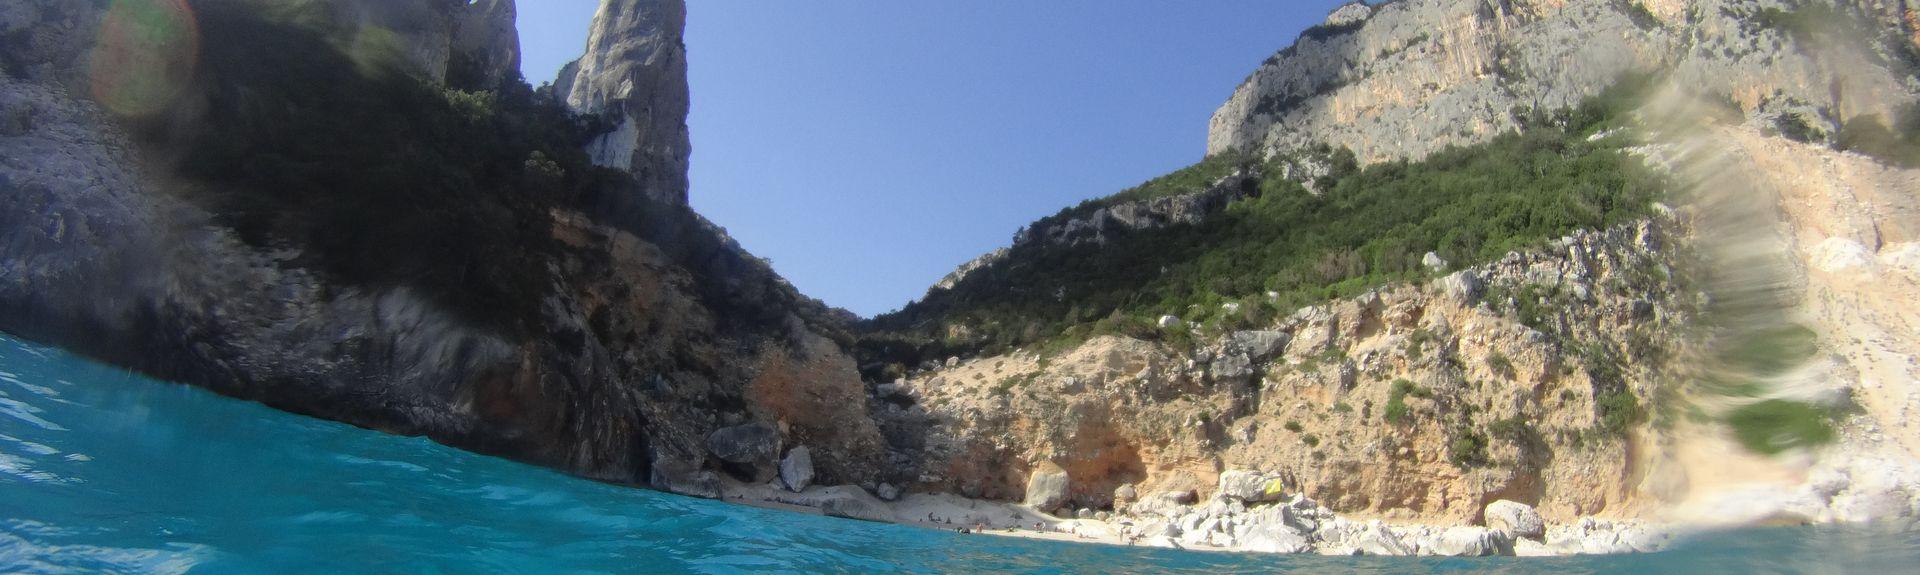 Villagrande Strisaili, Sardinien, Italien